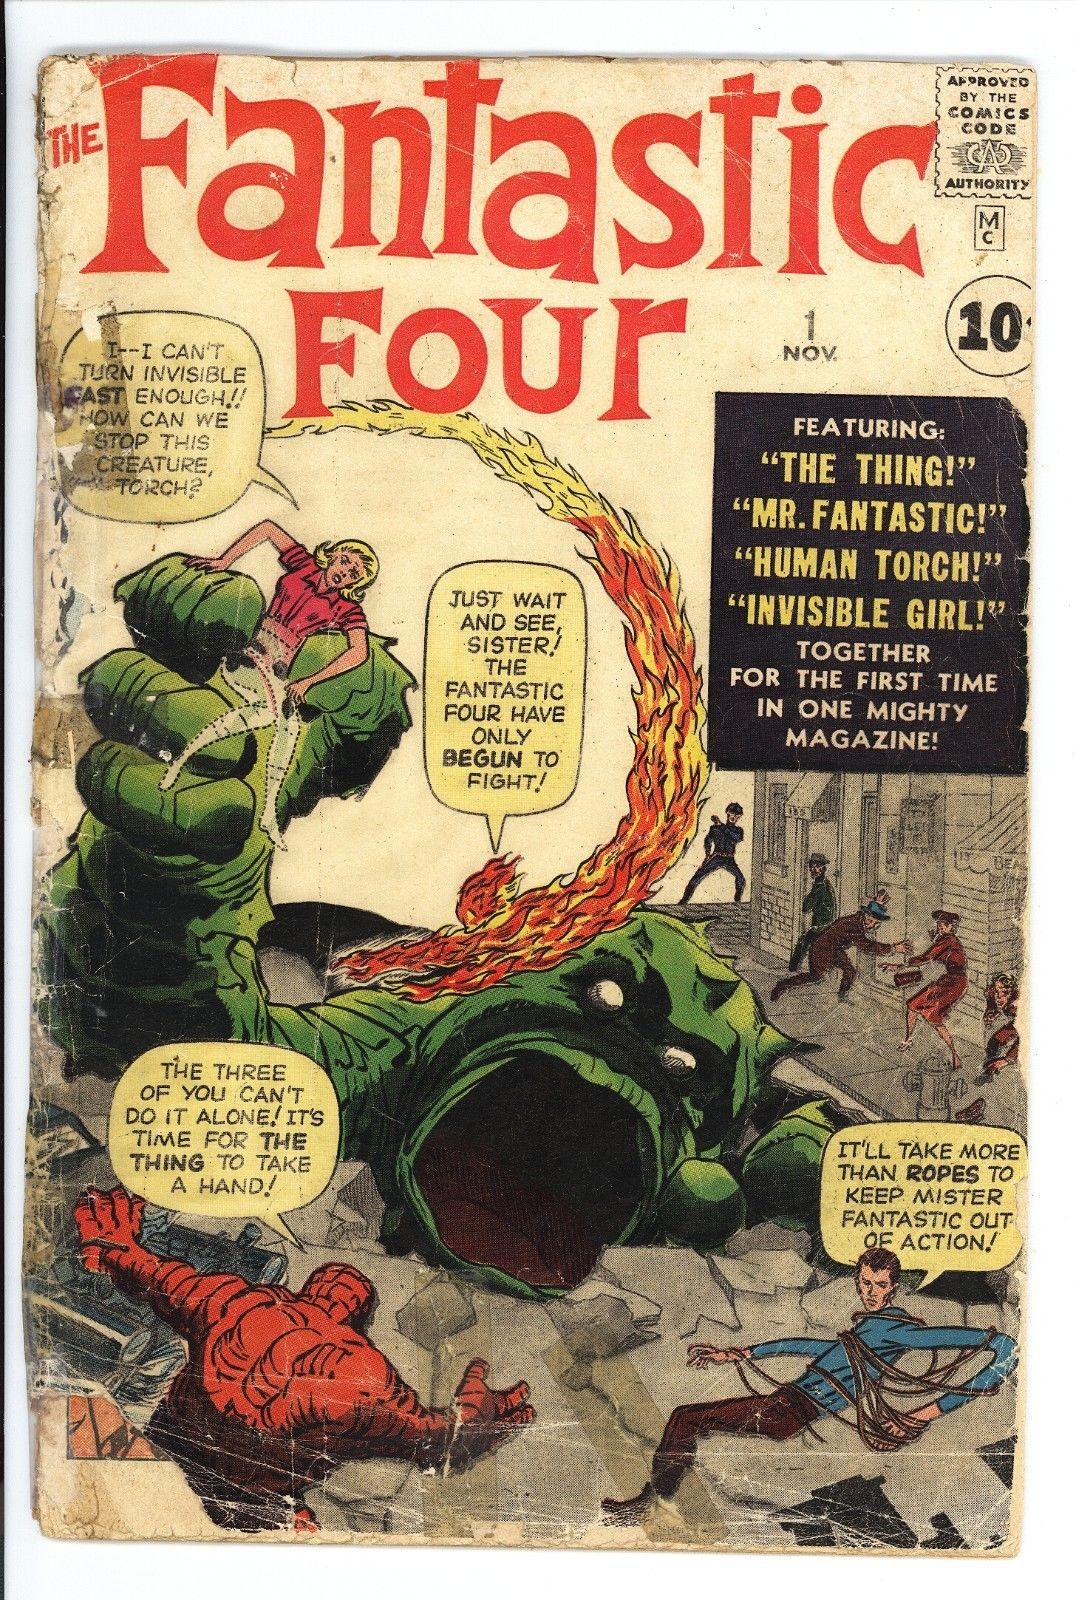 Fantastic Four #1 Vol 1 Nice Low Grade Original 1961 1st App of Fantastic Four